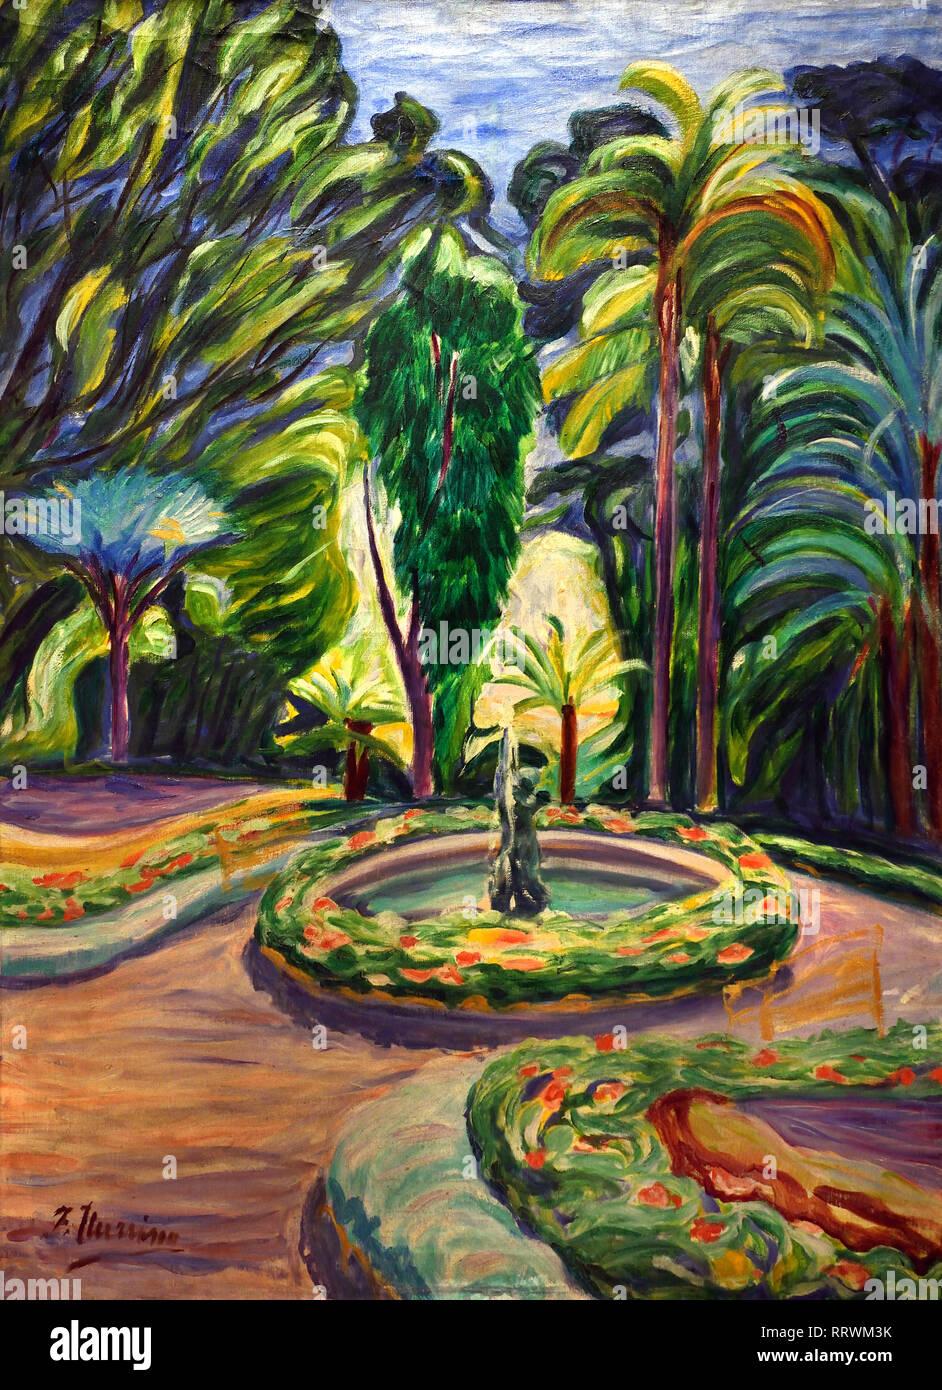 Garden of la Concepcion 1913-1919 Francisco Iturrino (1864-1924) Spain, Spanish - Stock Image